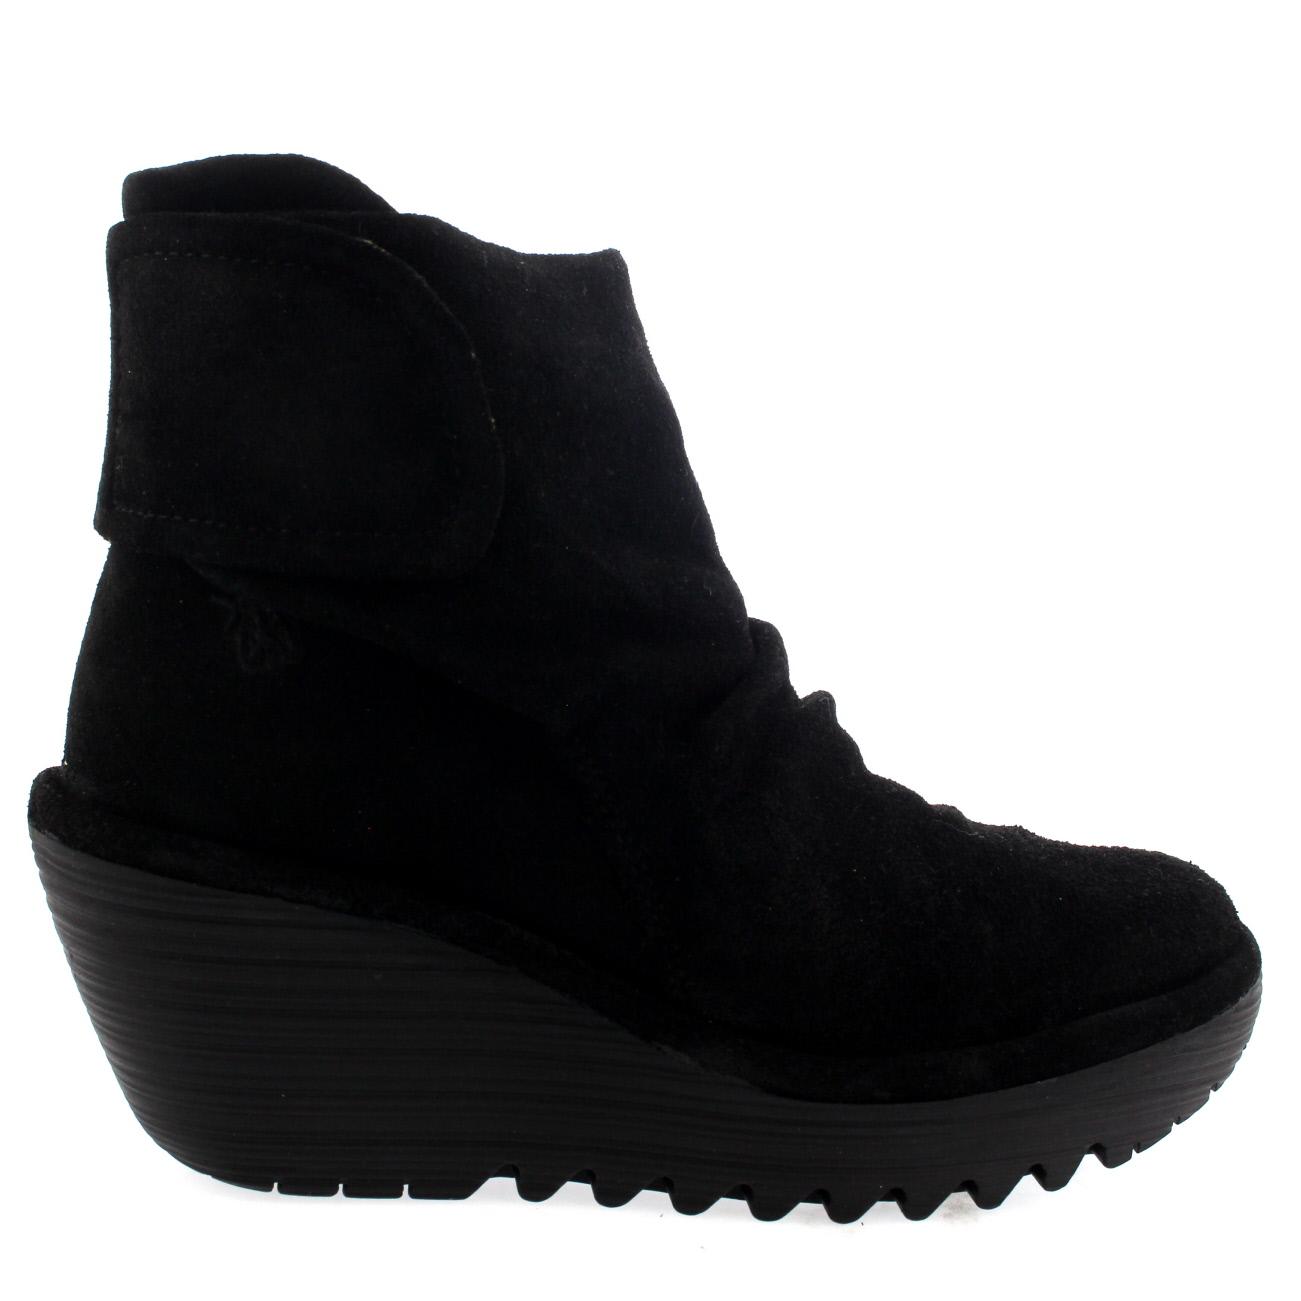 Womens Fly London Yegi Wedge Heel Suede Velcro Casual Winter Ankle ...